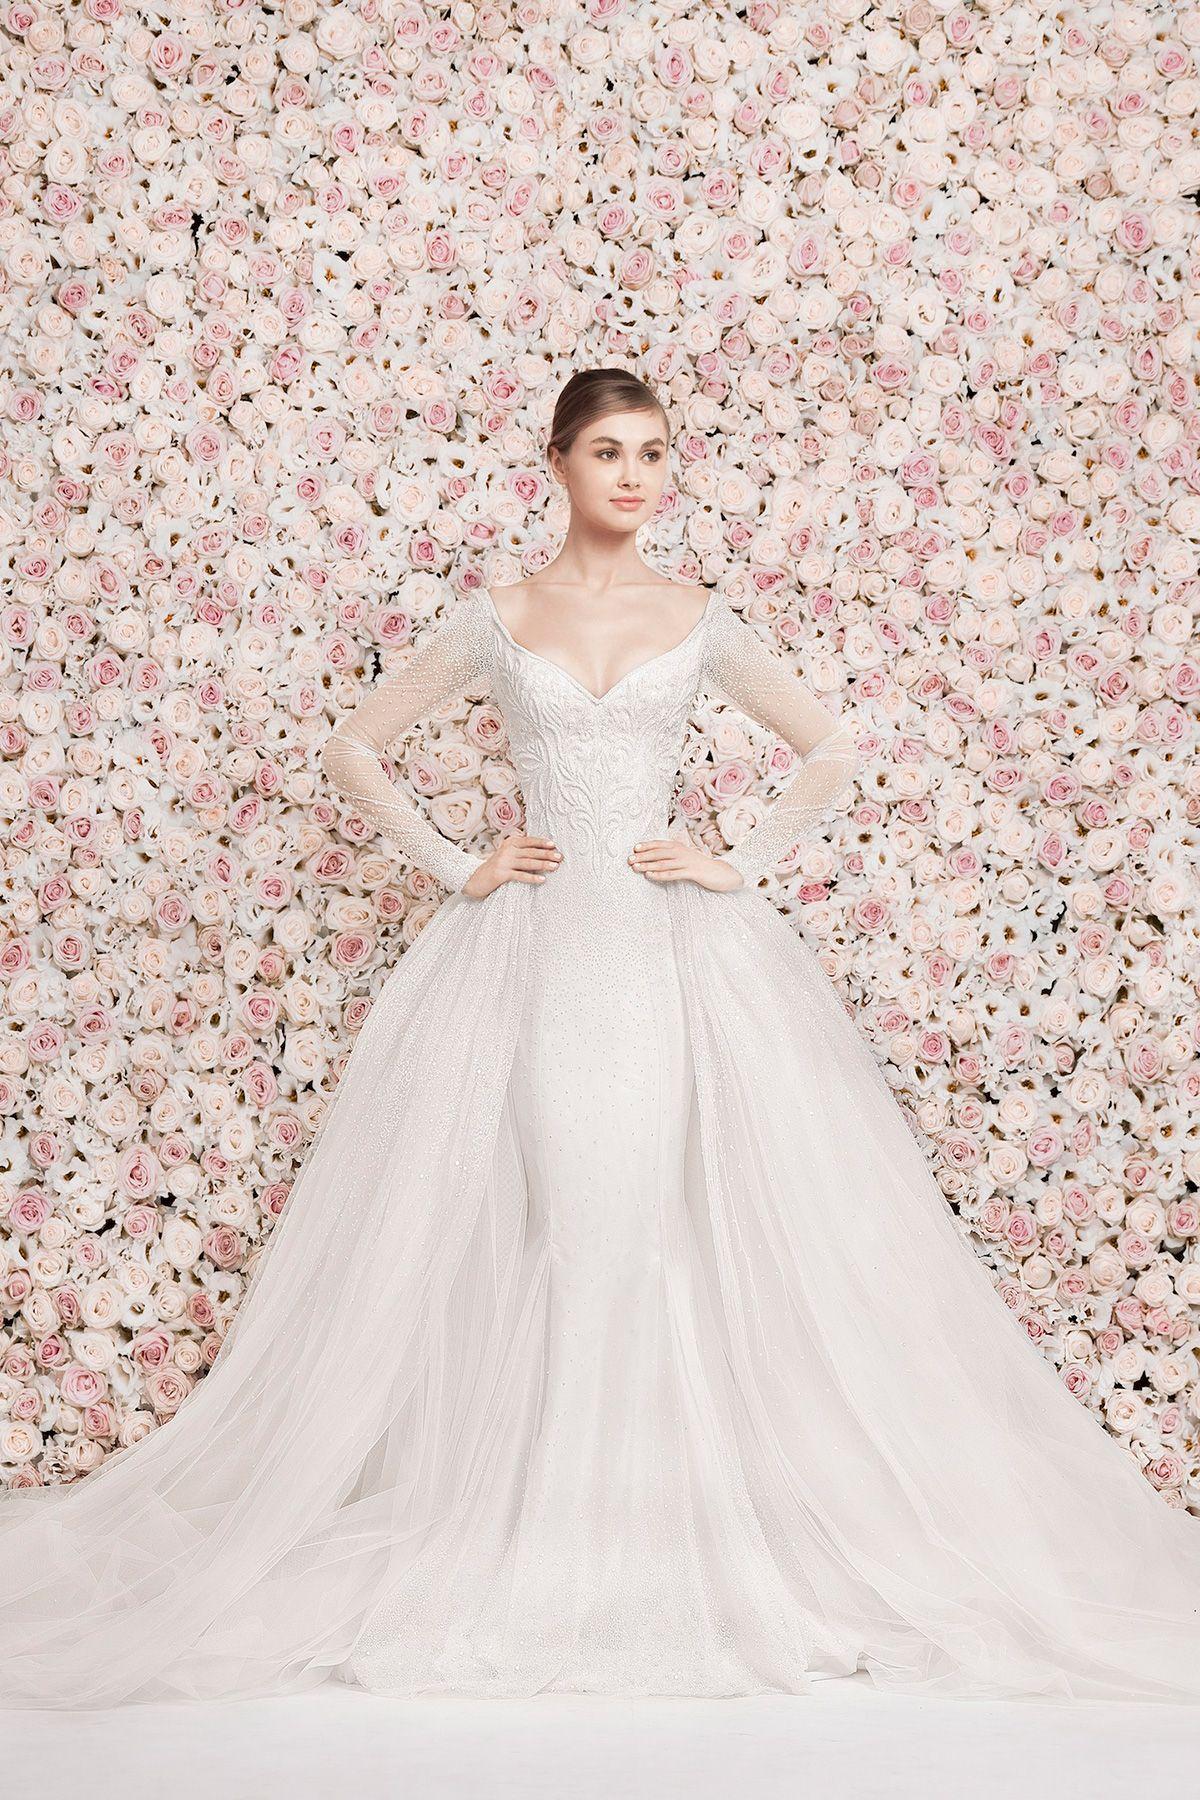 14 Lebanese Fashion Designers Who Make the Most Beautiful Wedding 47